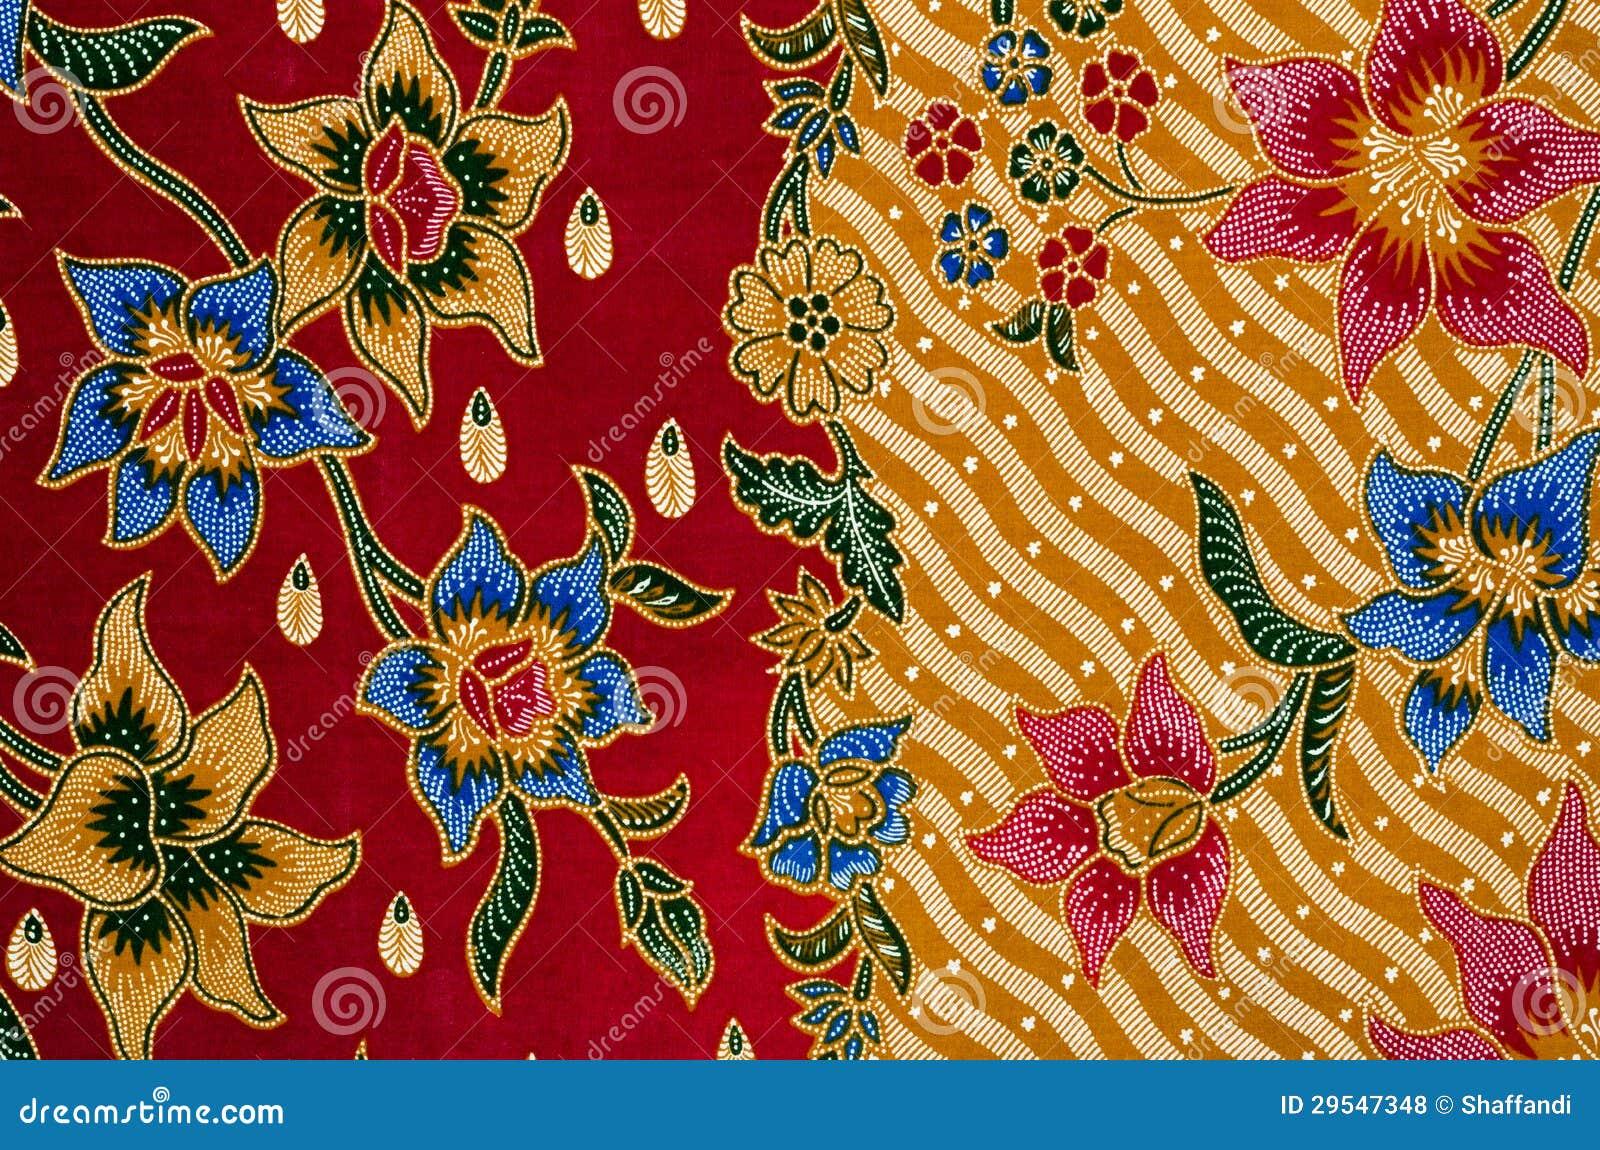 Batik Design Royalty Free Stock Photos - Image: 29547348